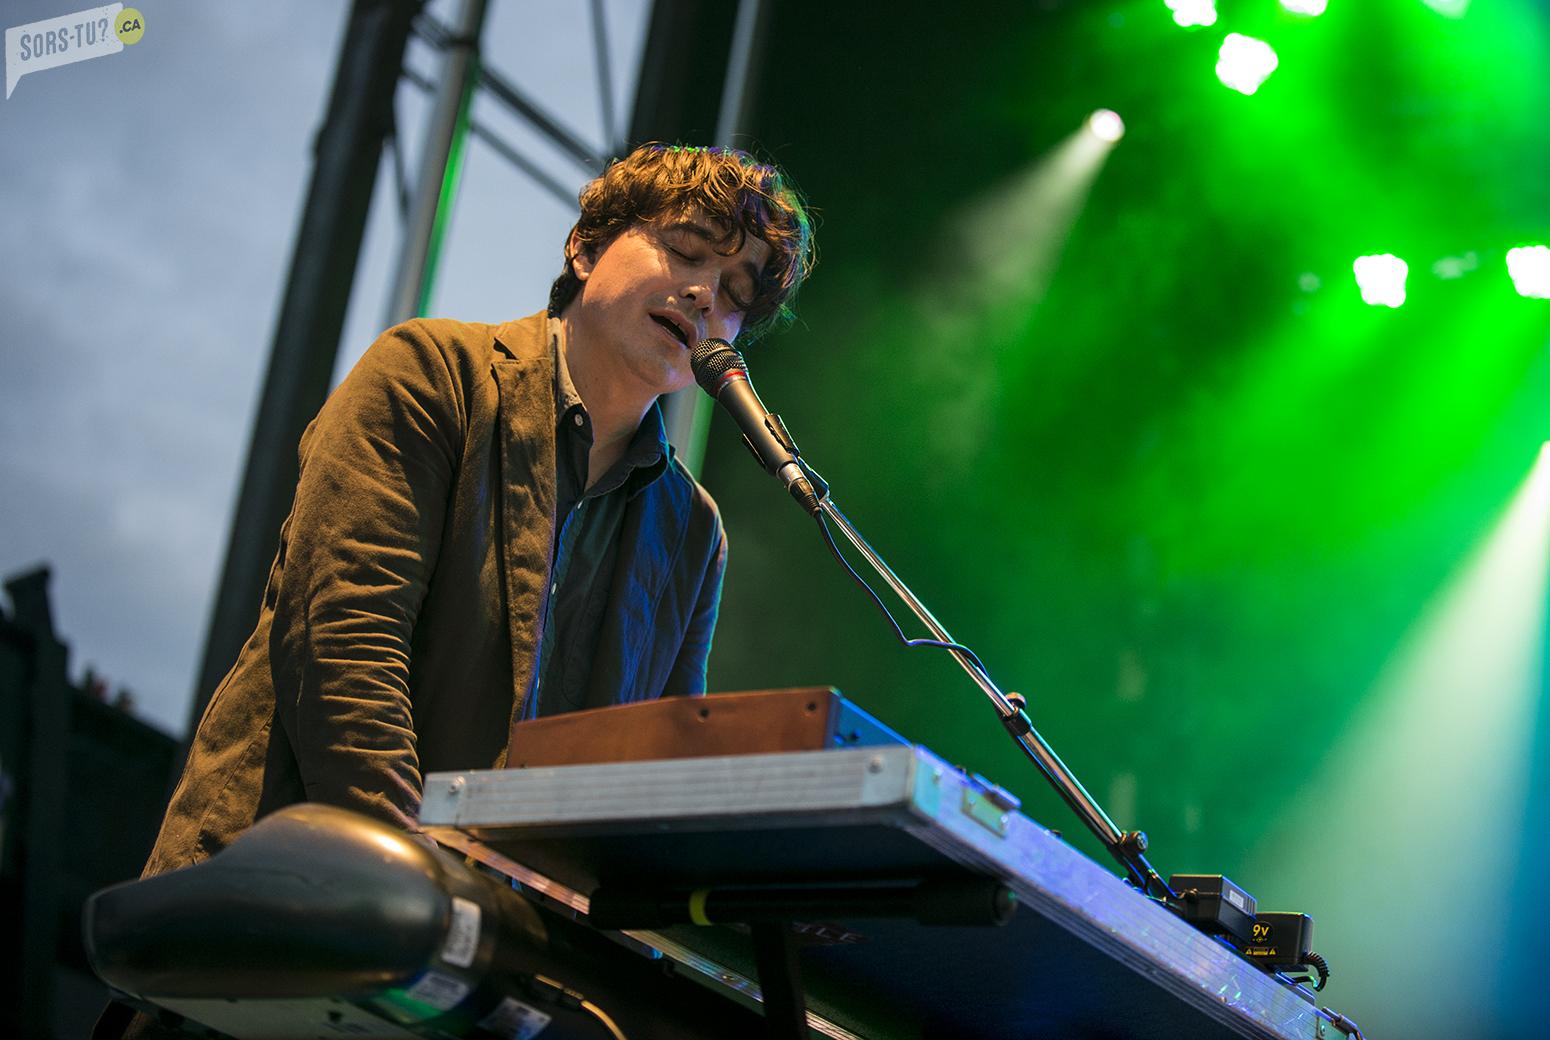 Wolfparade-rbcbluesfest-ottawa-festival-sorstu-2016-7